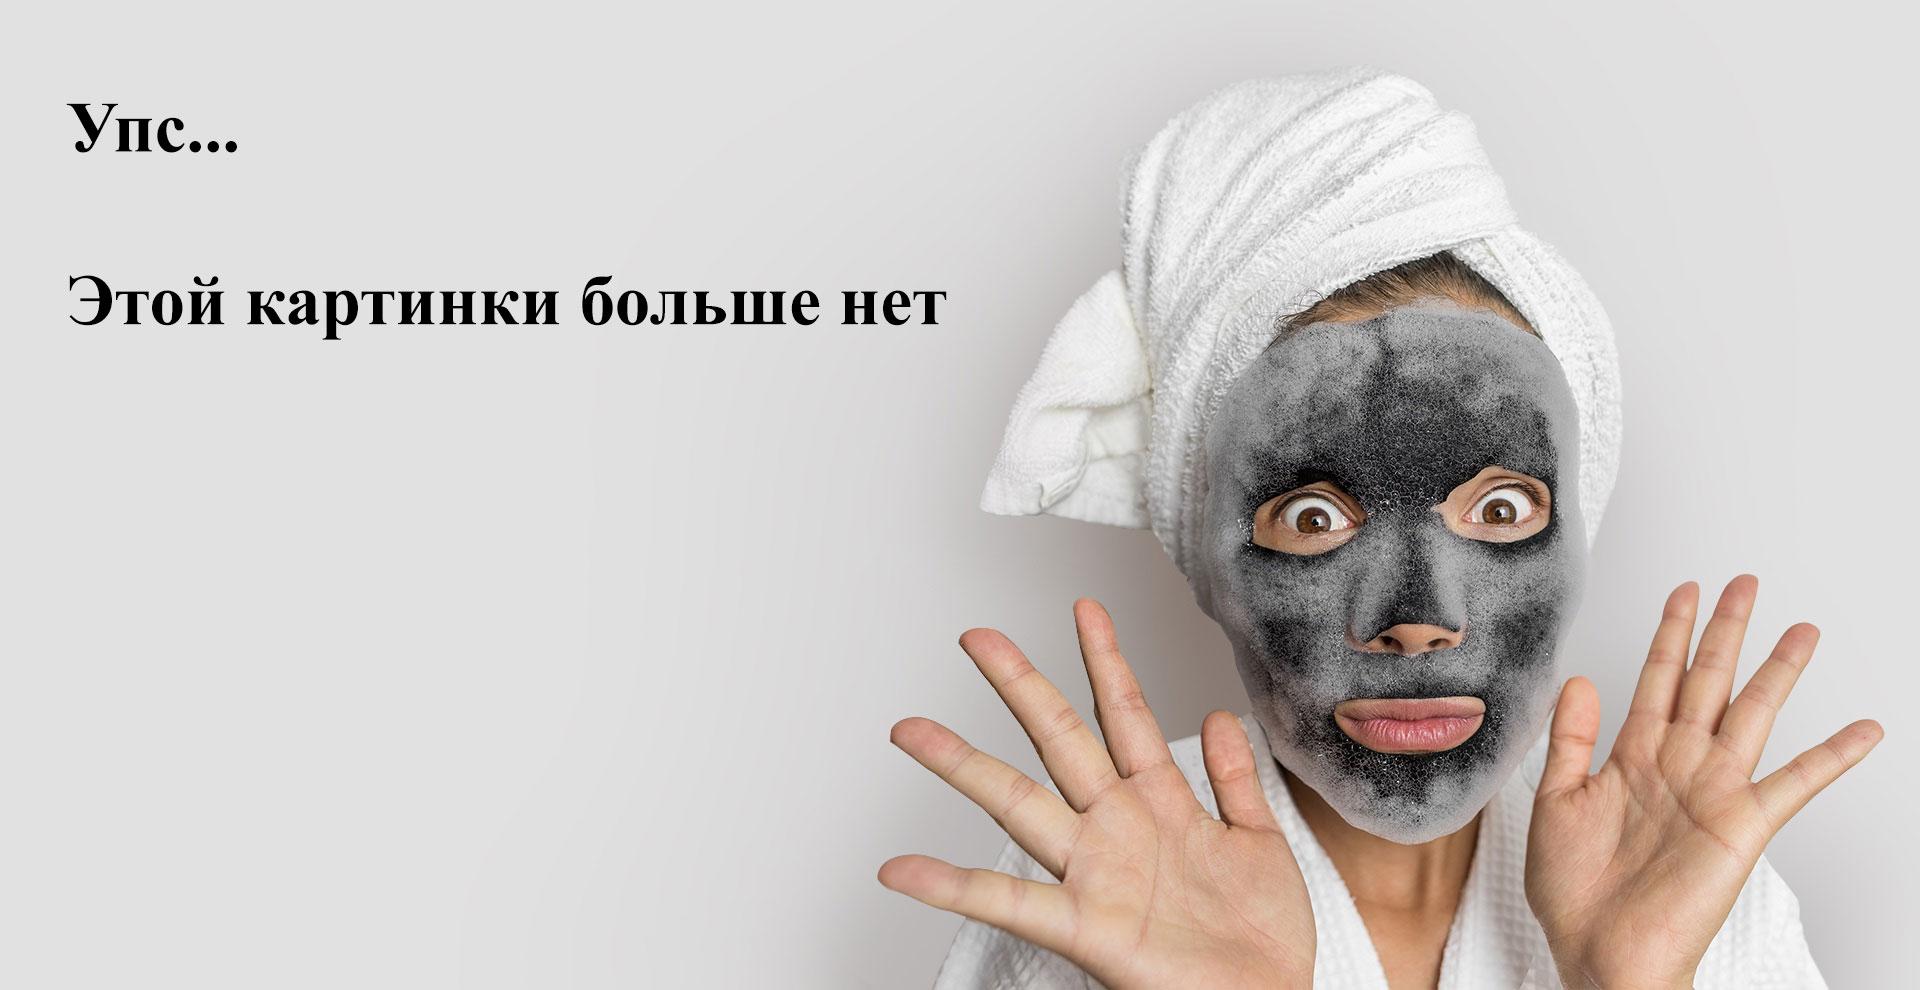 IRISK, Хна для биотатуажа бровей Eva Bond Beauty Collection, коричневая, 4 г